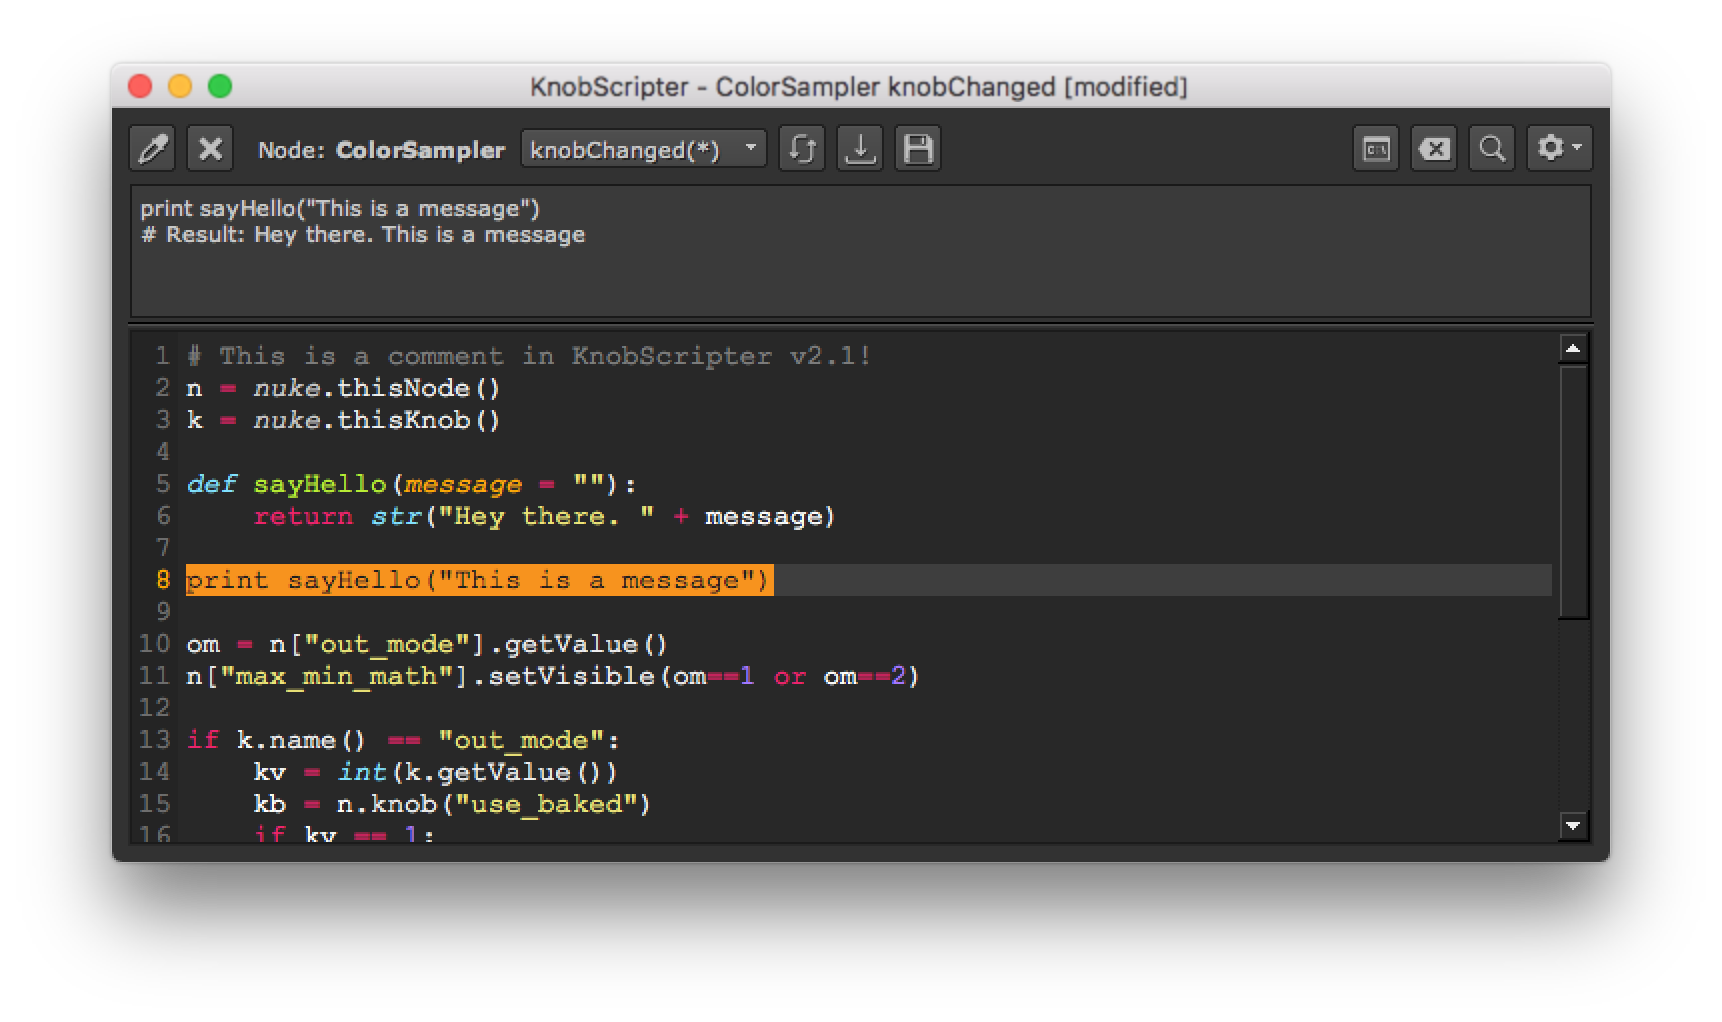 KnobScripter v2.1